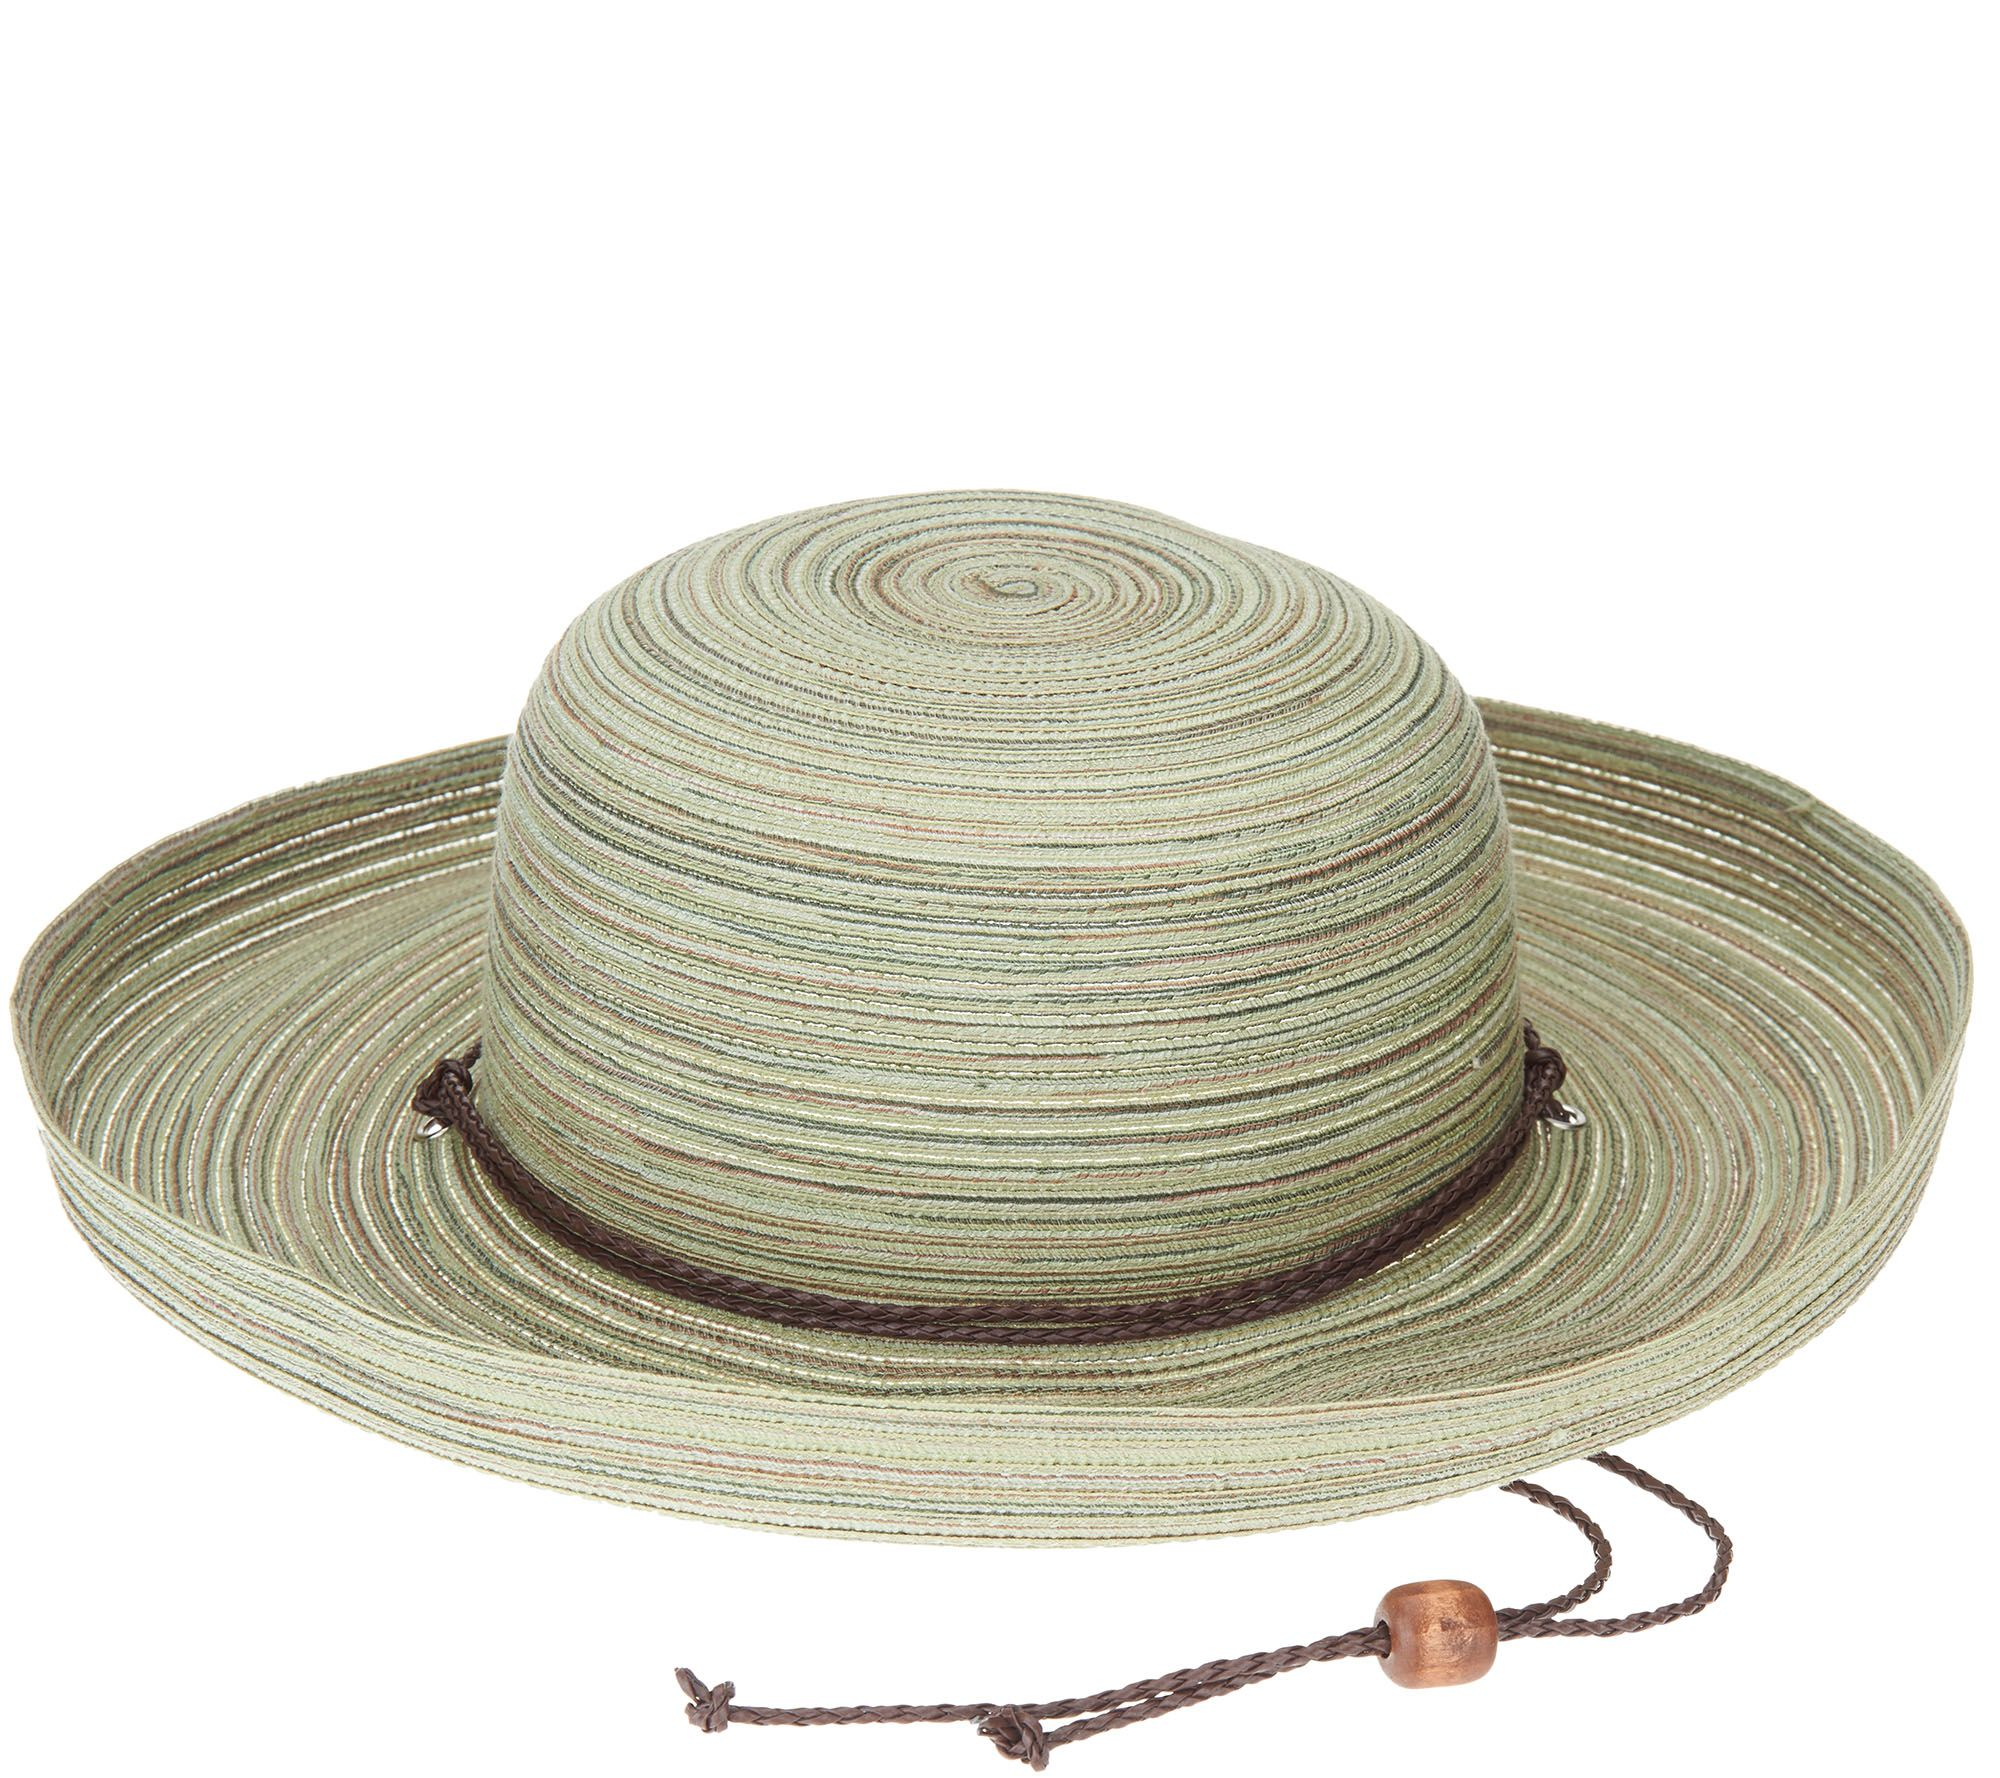 825f7aa01 San Diego Hat Co. Mixed Braid Kettle Brim Sun Hat — QVC.com